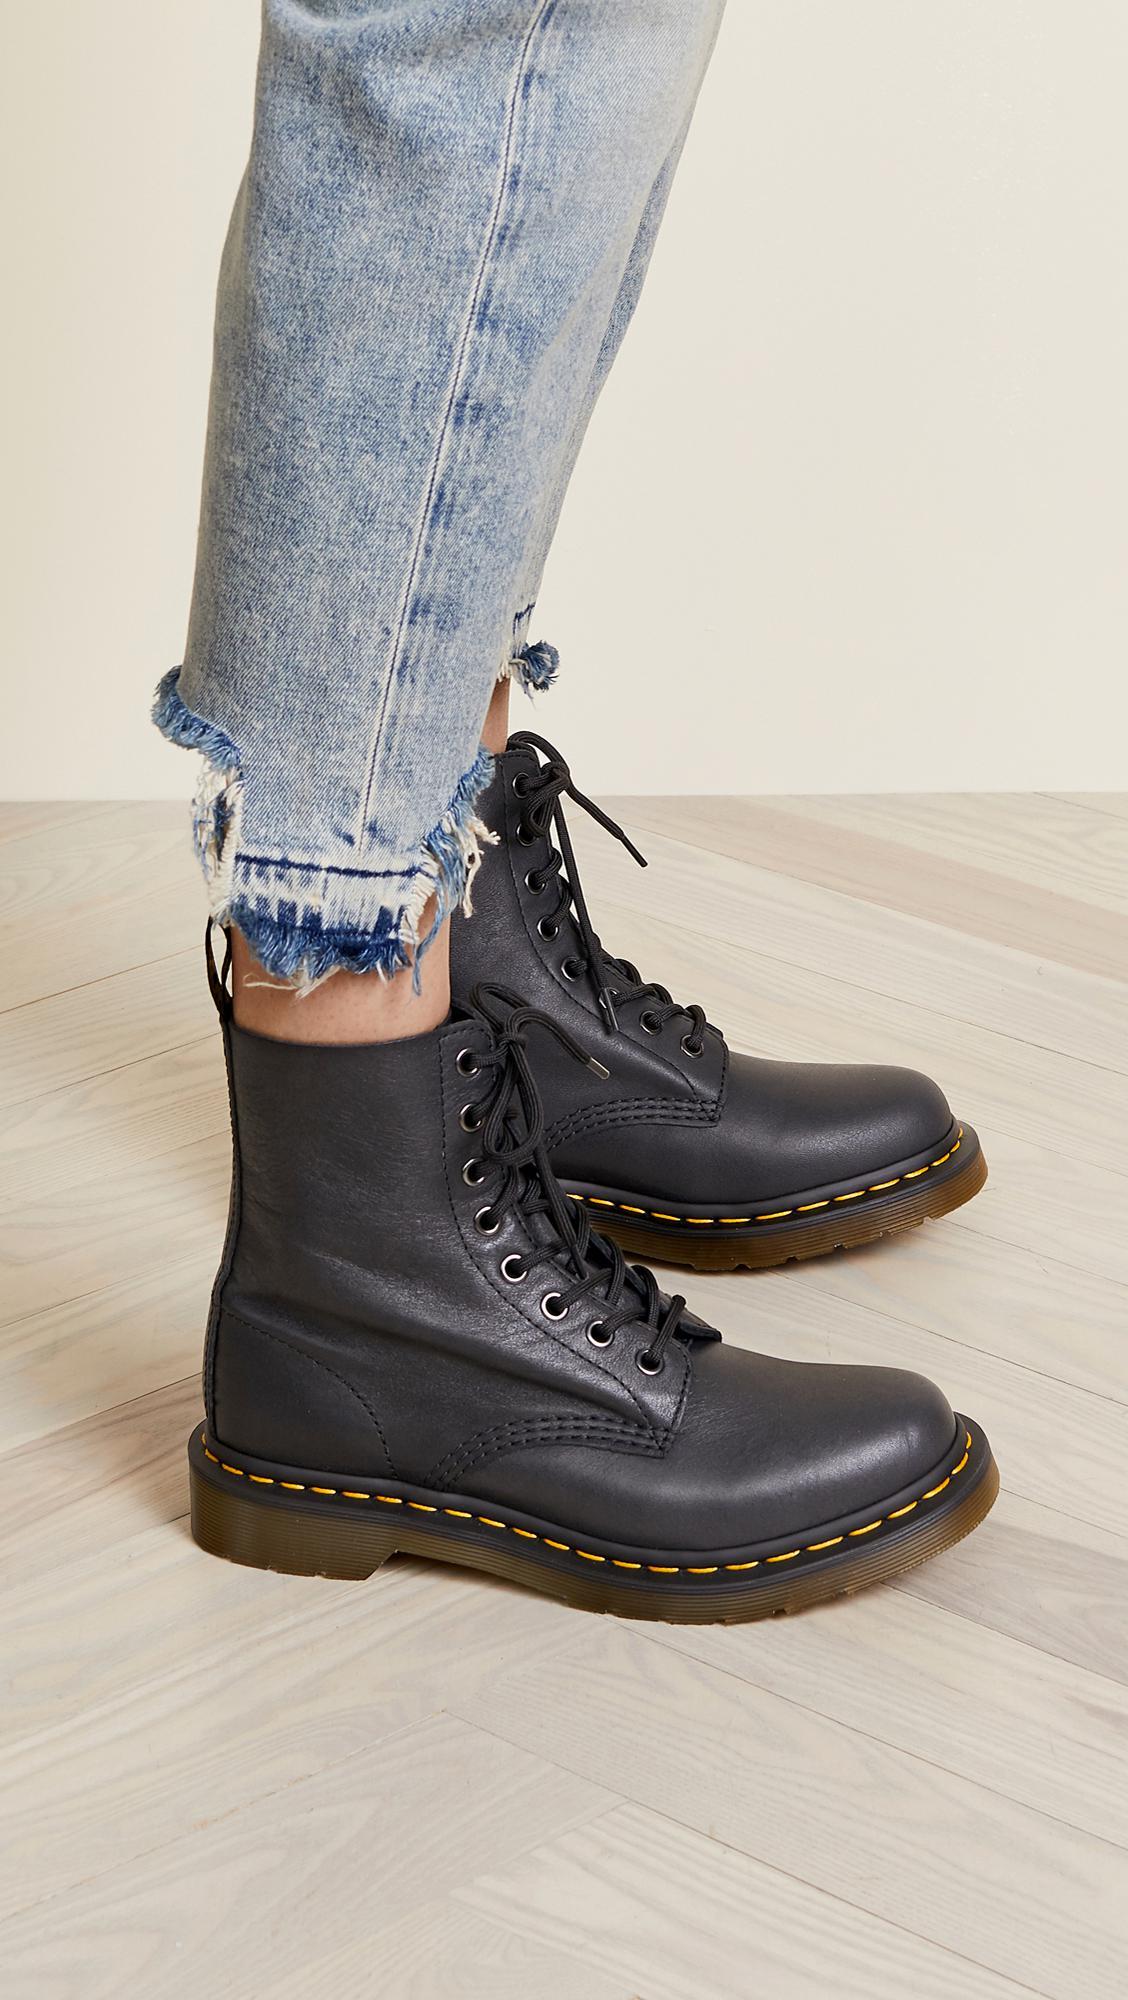 21586f8a0a Dr. Martens - Black 1460 Pascal 8 Eye Boots - Lyst. View fullscreen